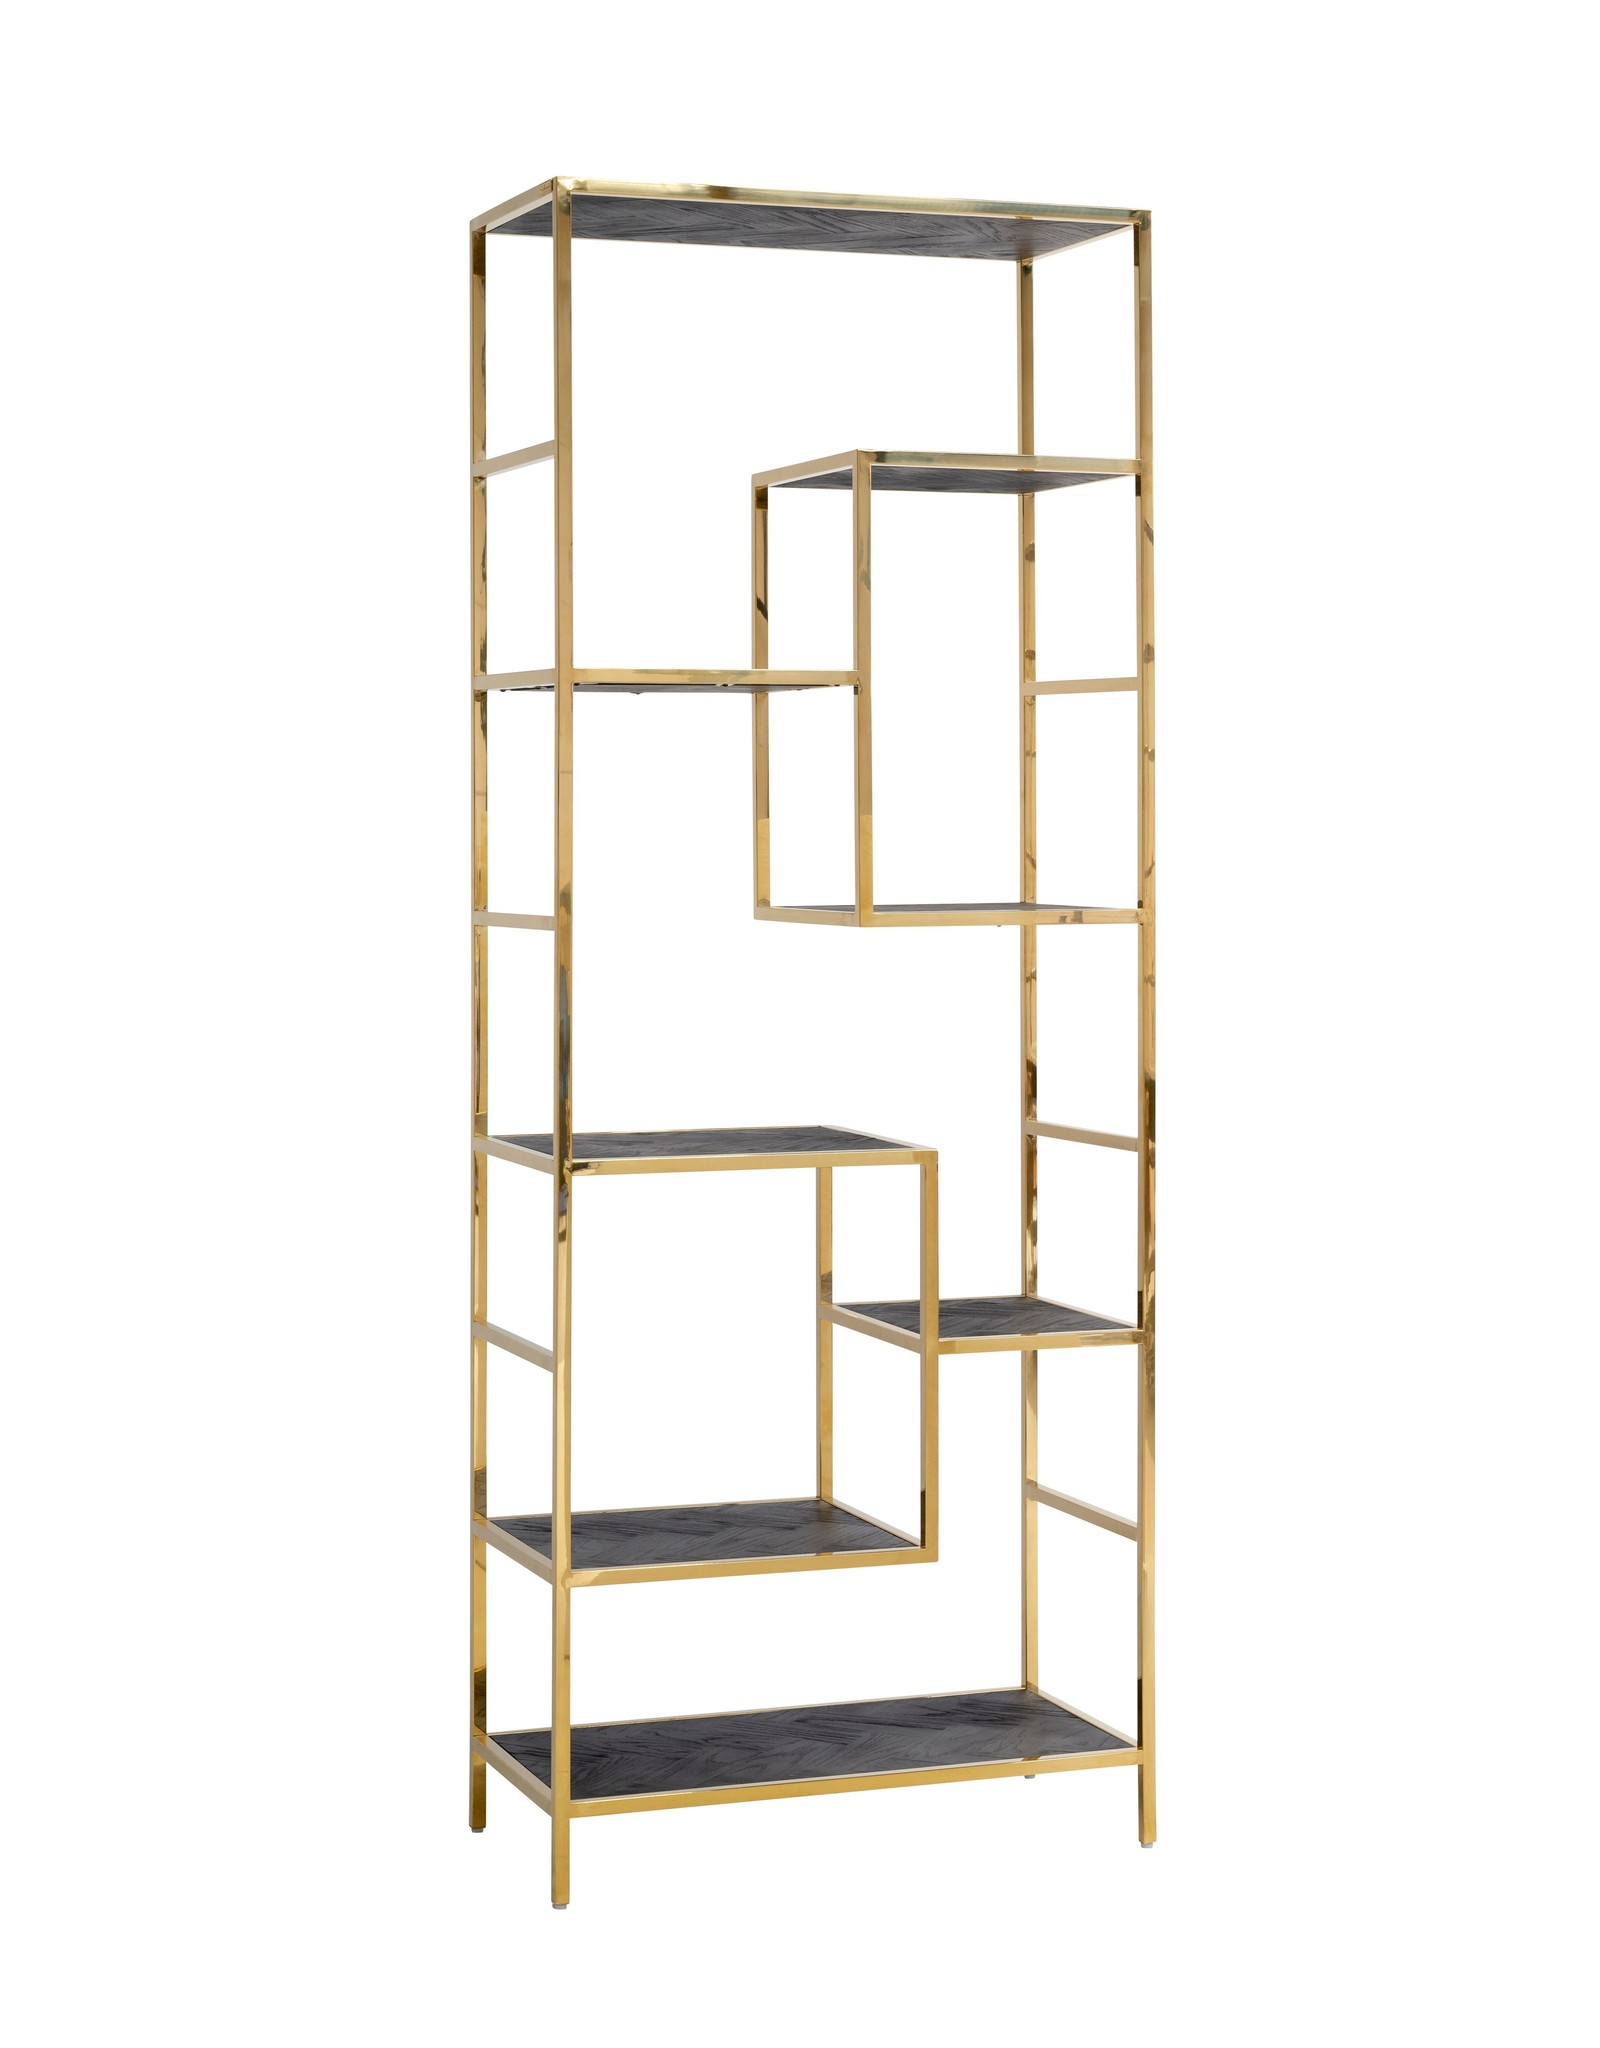 Richmond Interiors Wandkast Blackbone gold 7-planken